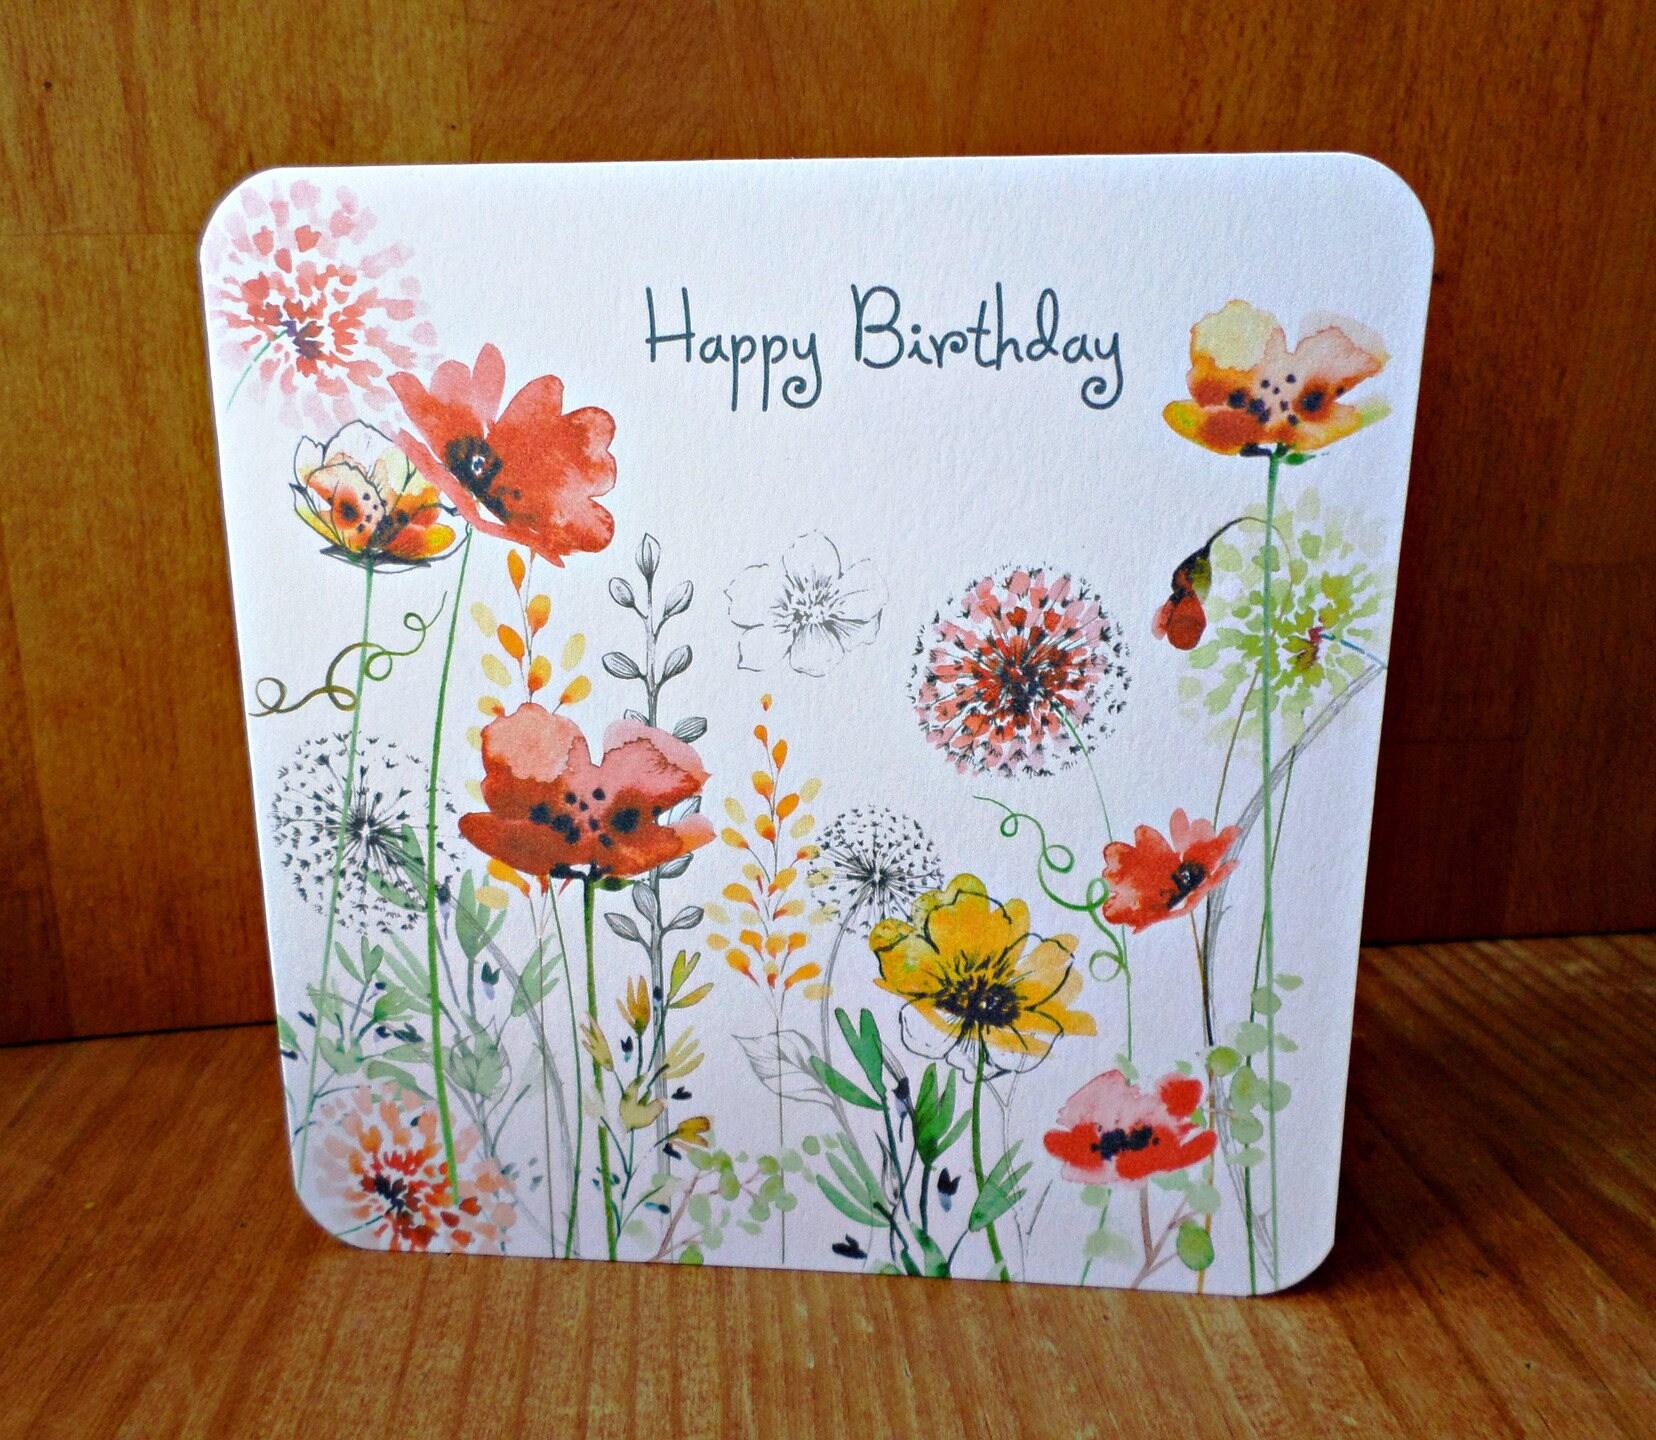 Happy birthday flowers 15cm x 15cm greeting card etsy zoom izmirmasajfo